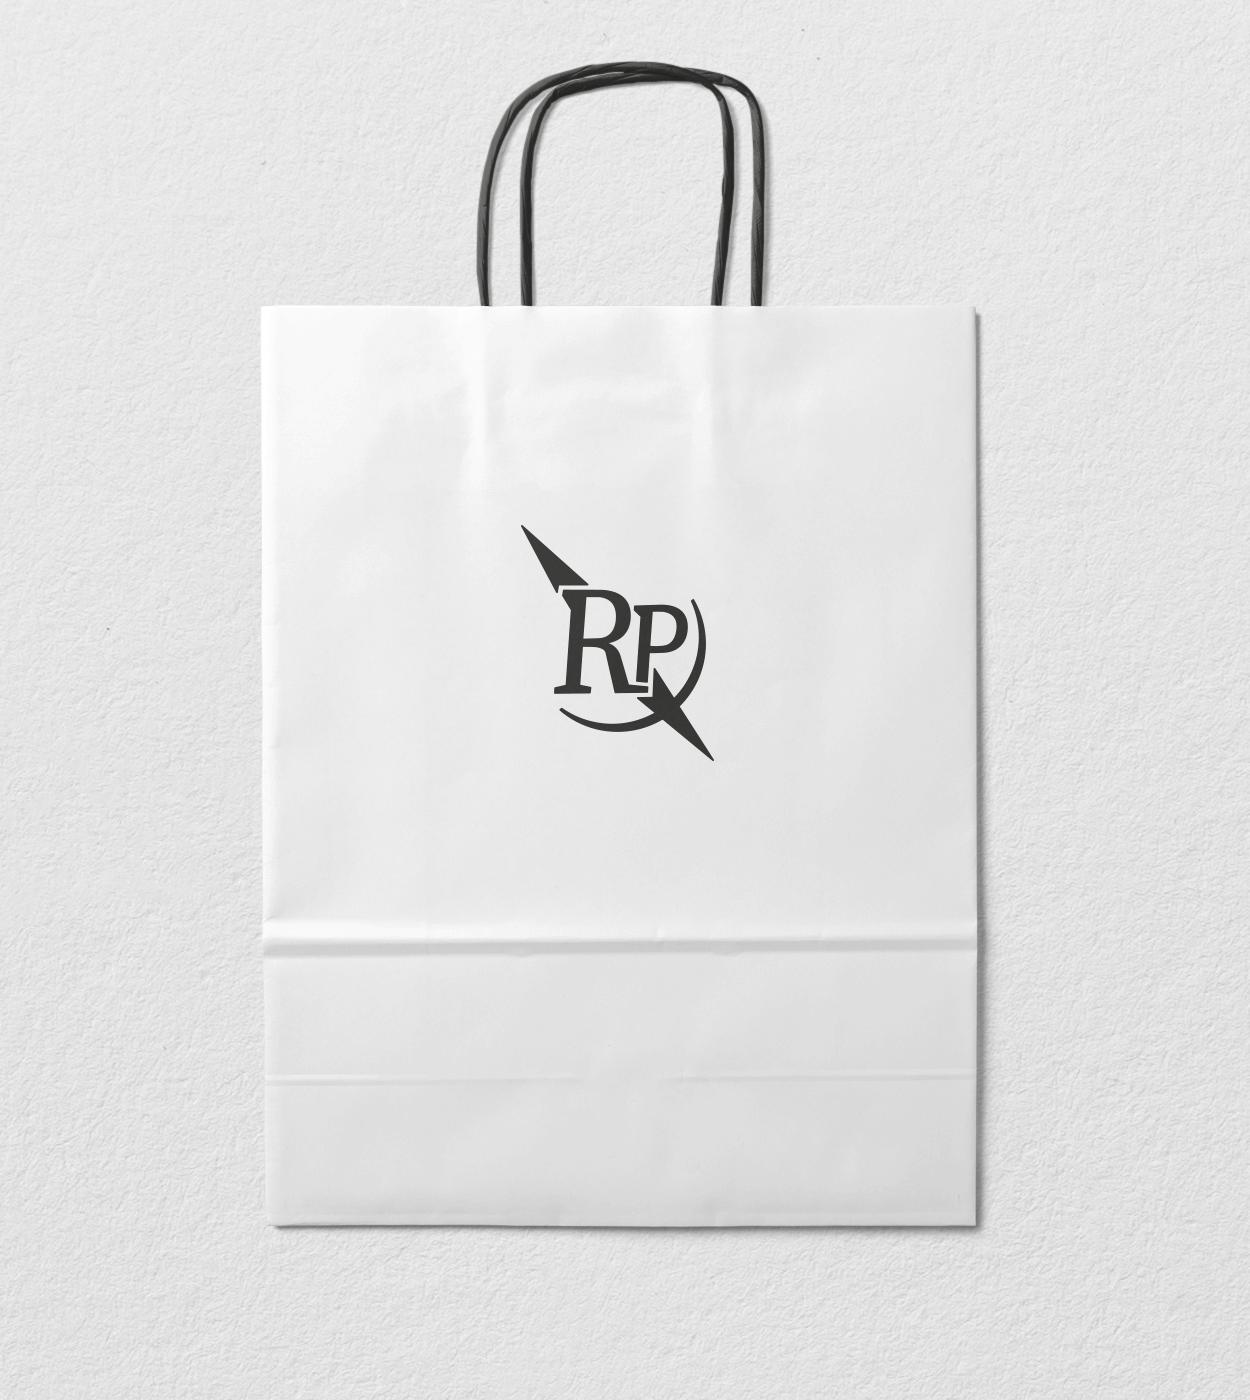 rp-shopping-bag-mockup.png